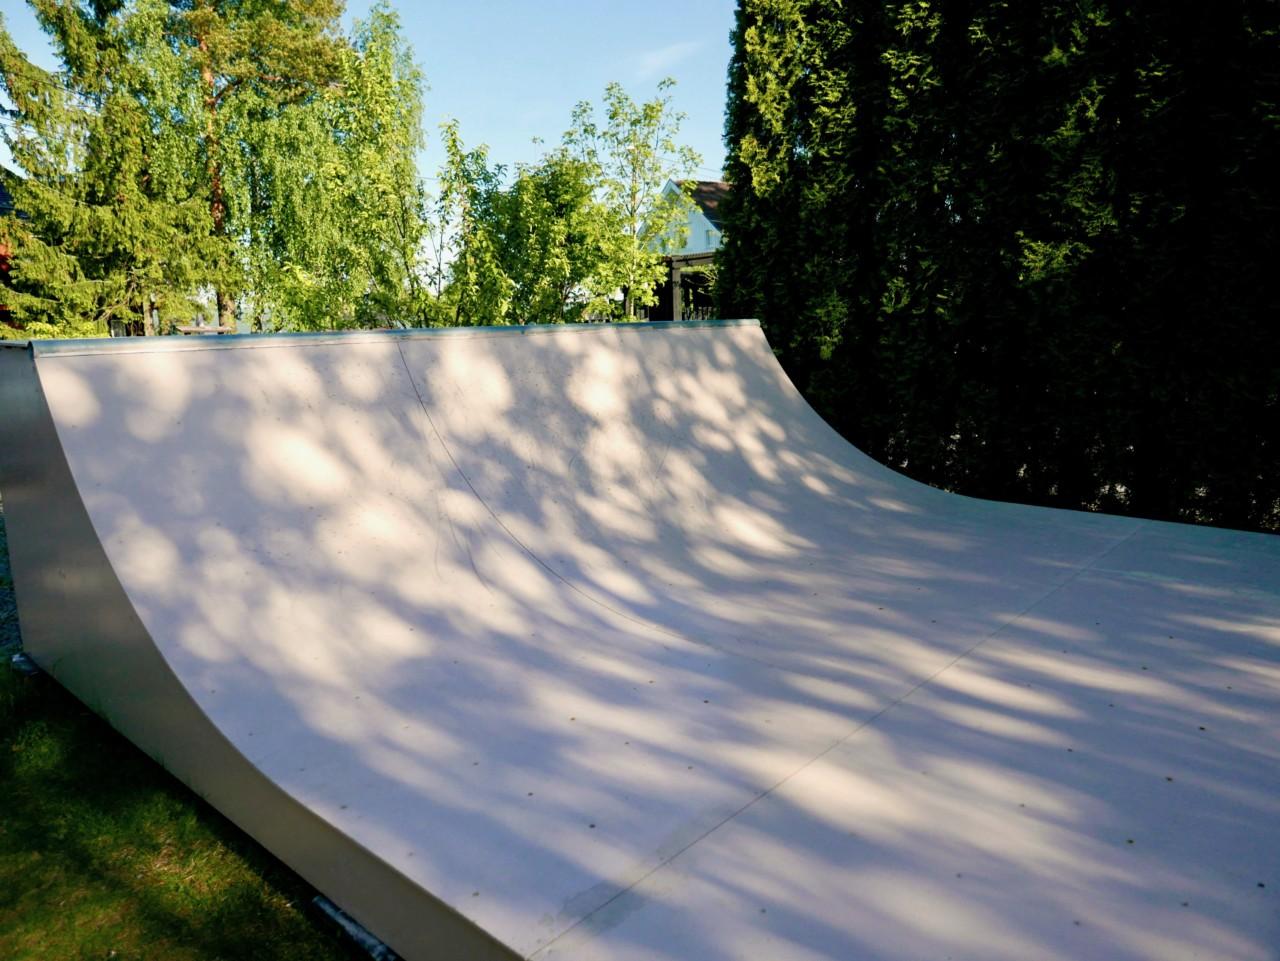 perfekt-solseng-skate-rampe-dusky-pink-green-house